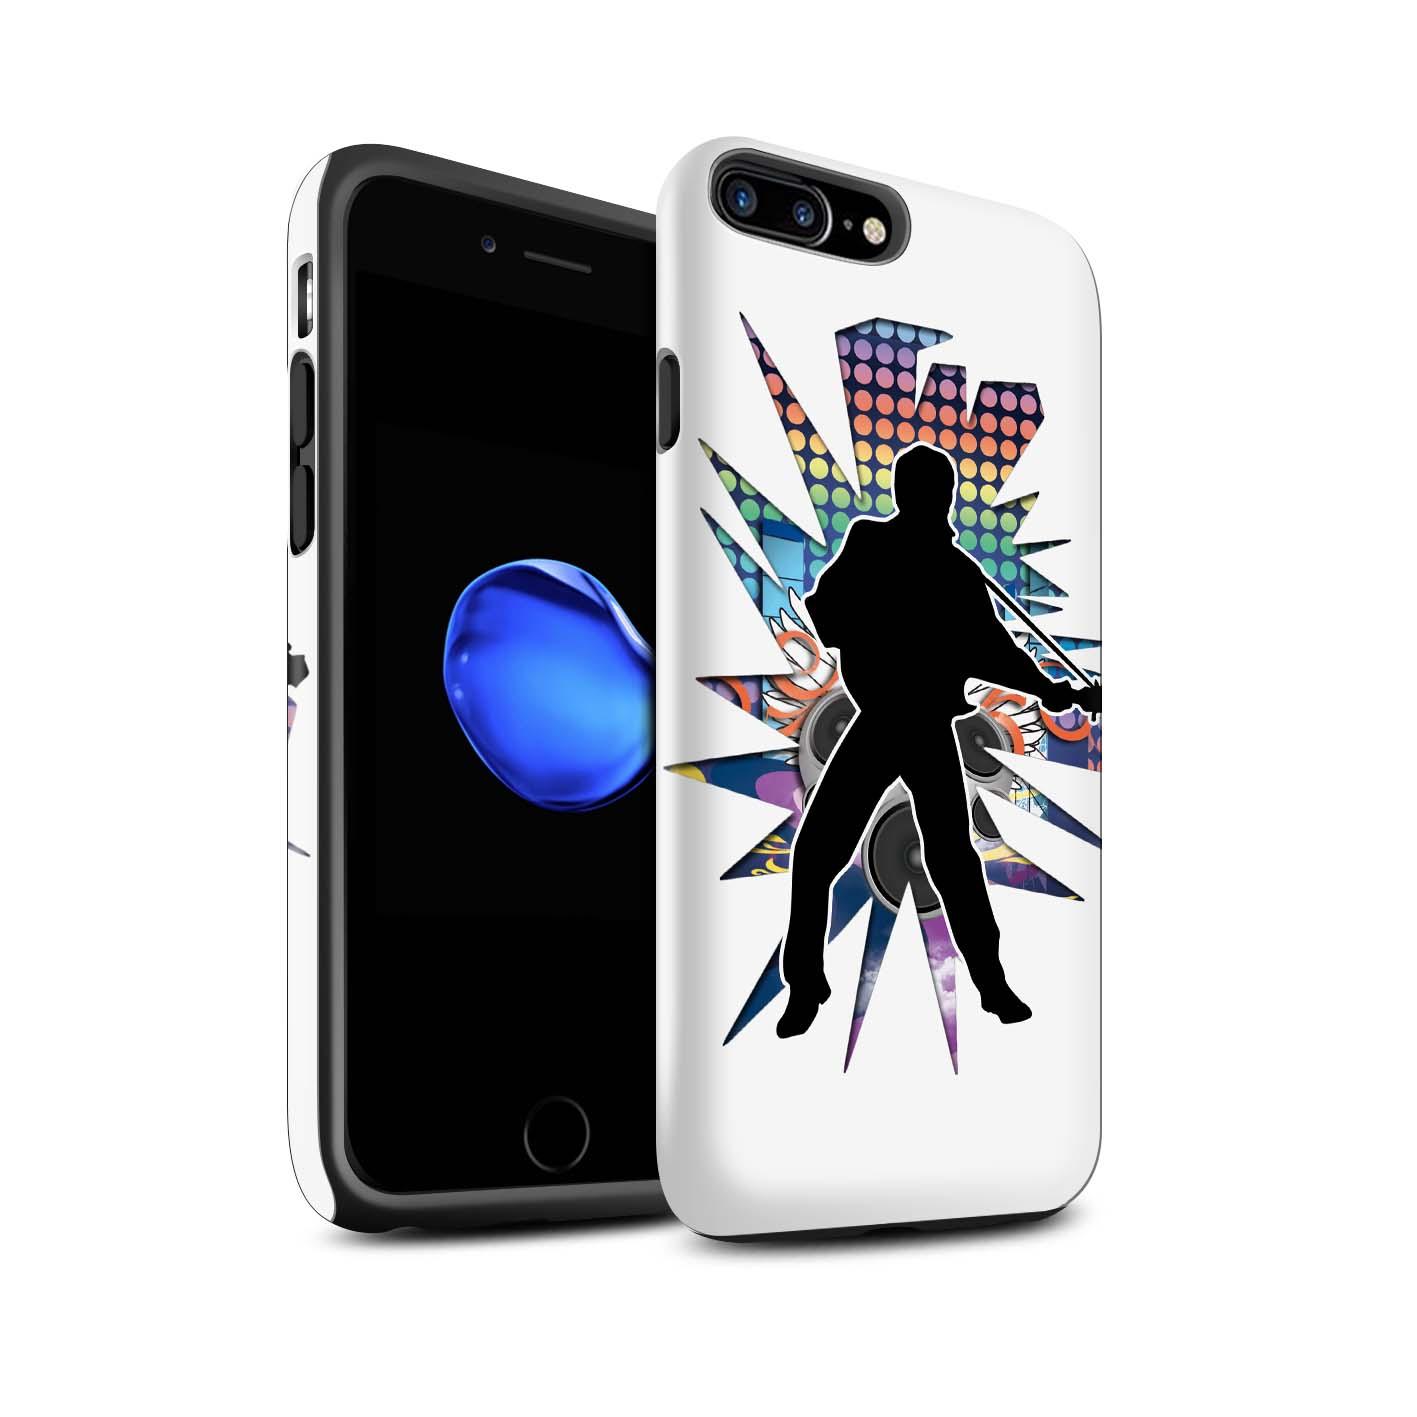 Robuste-Matte-Antichoc-Etui-STUFF4-pour-Apple-iPhone-7-Plus-Rock-Star-Pose